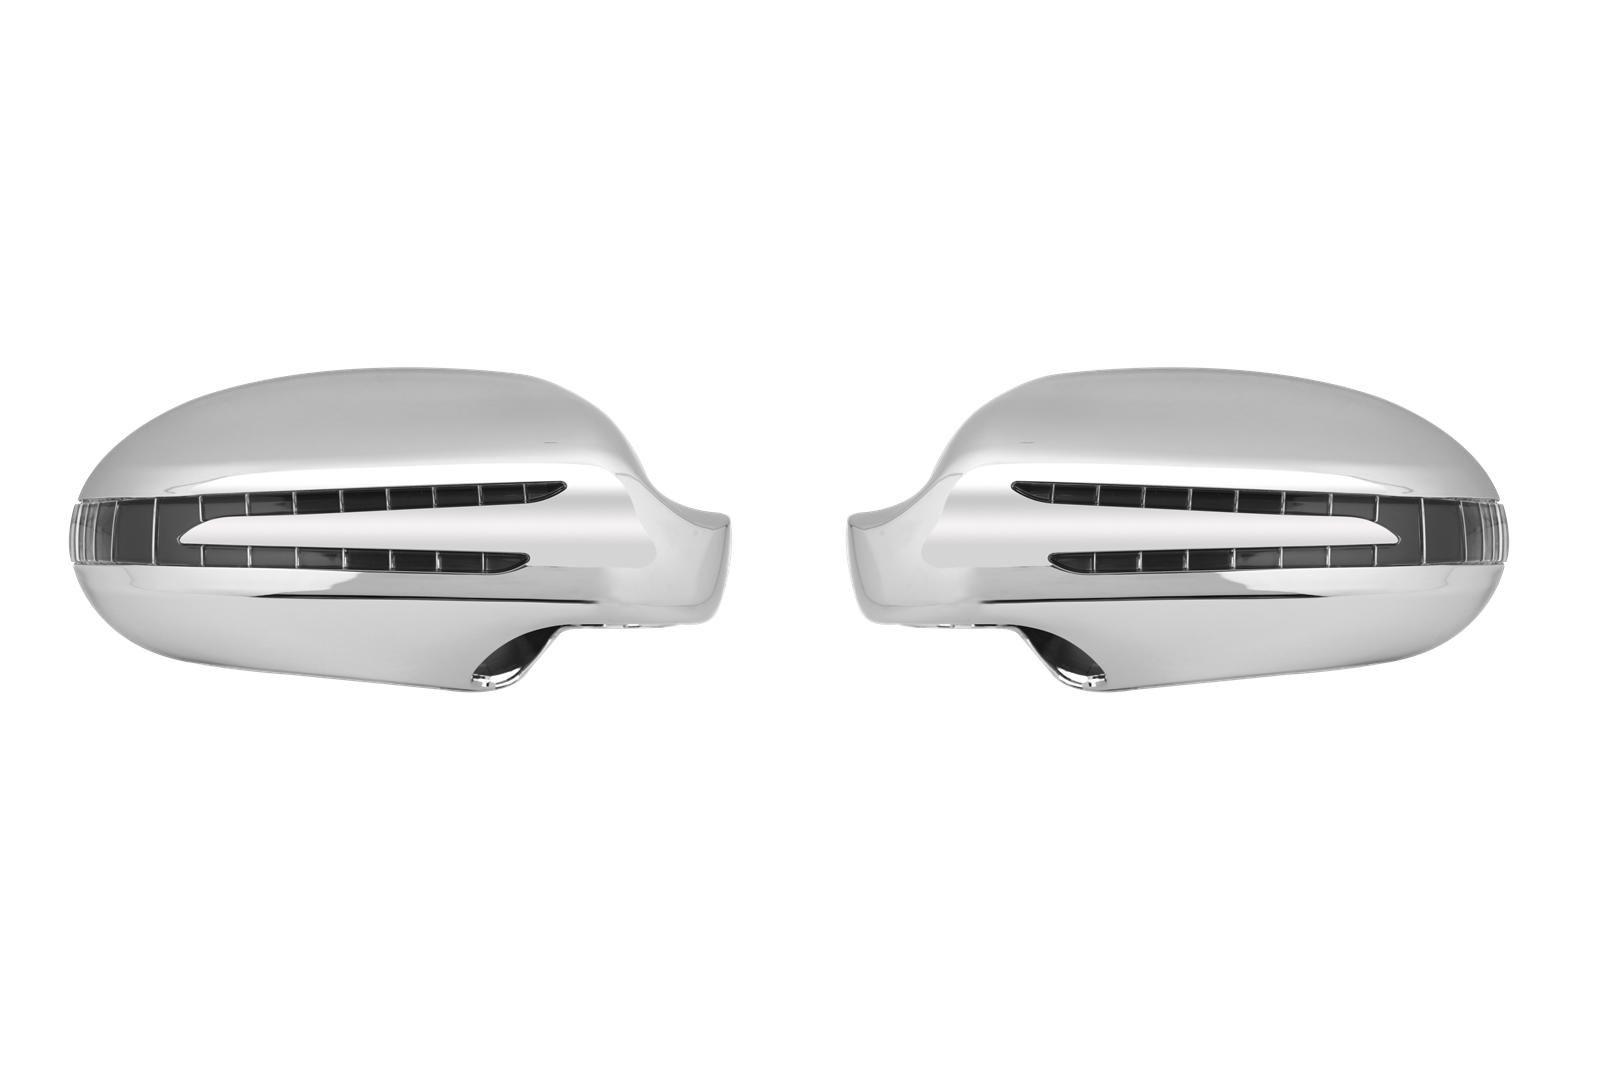 Maronad Kryty zrcátek LED blikač Mercedes CLK W209 / SL R230, chrom